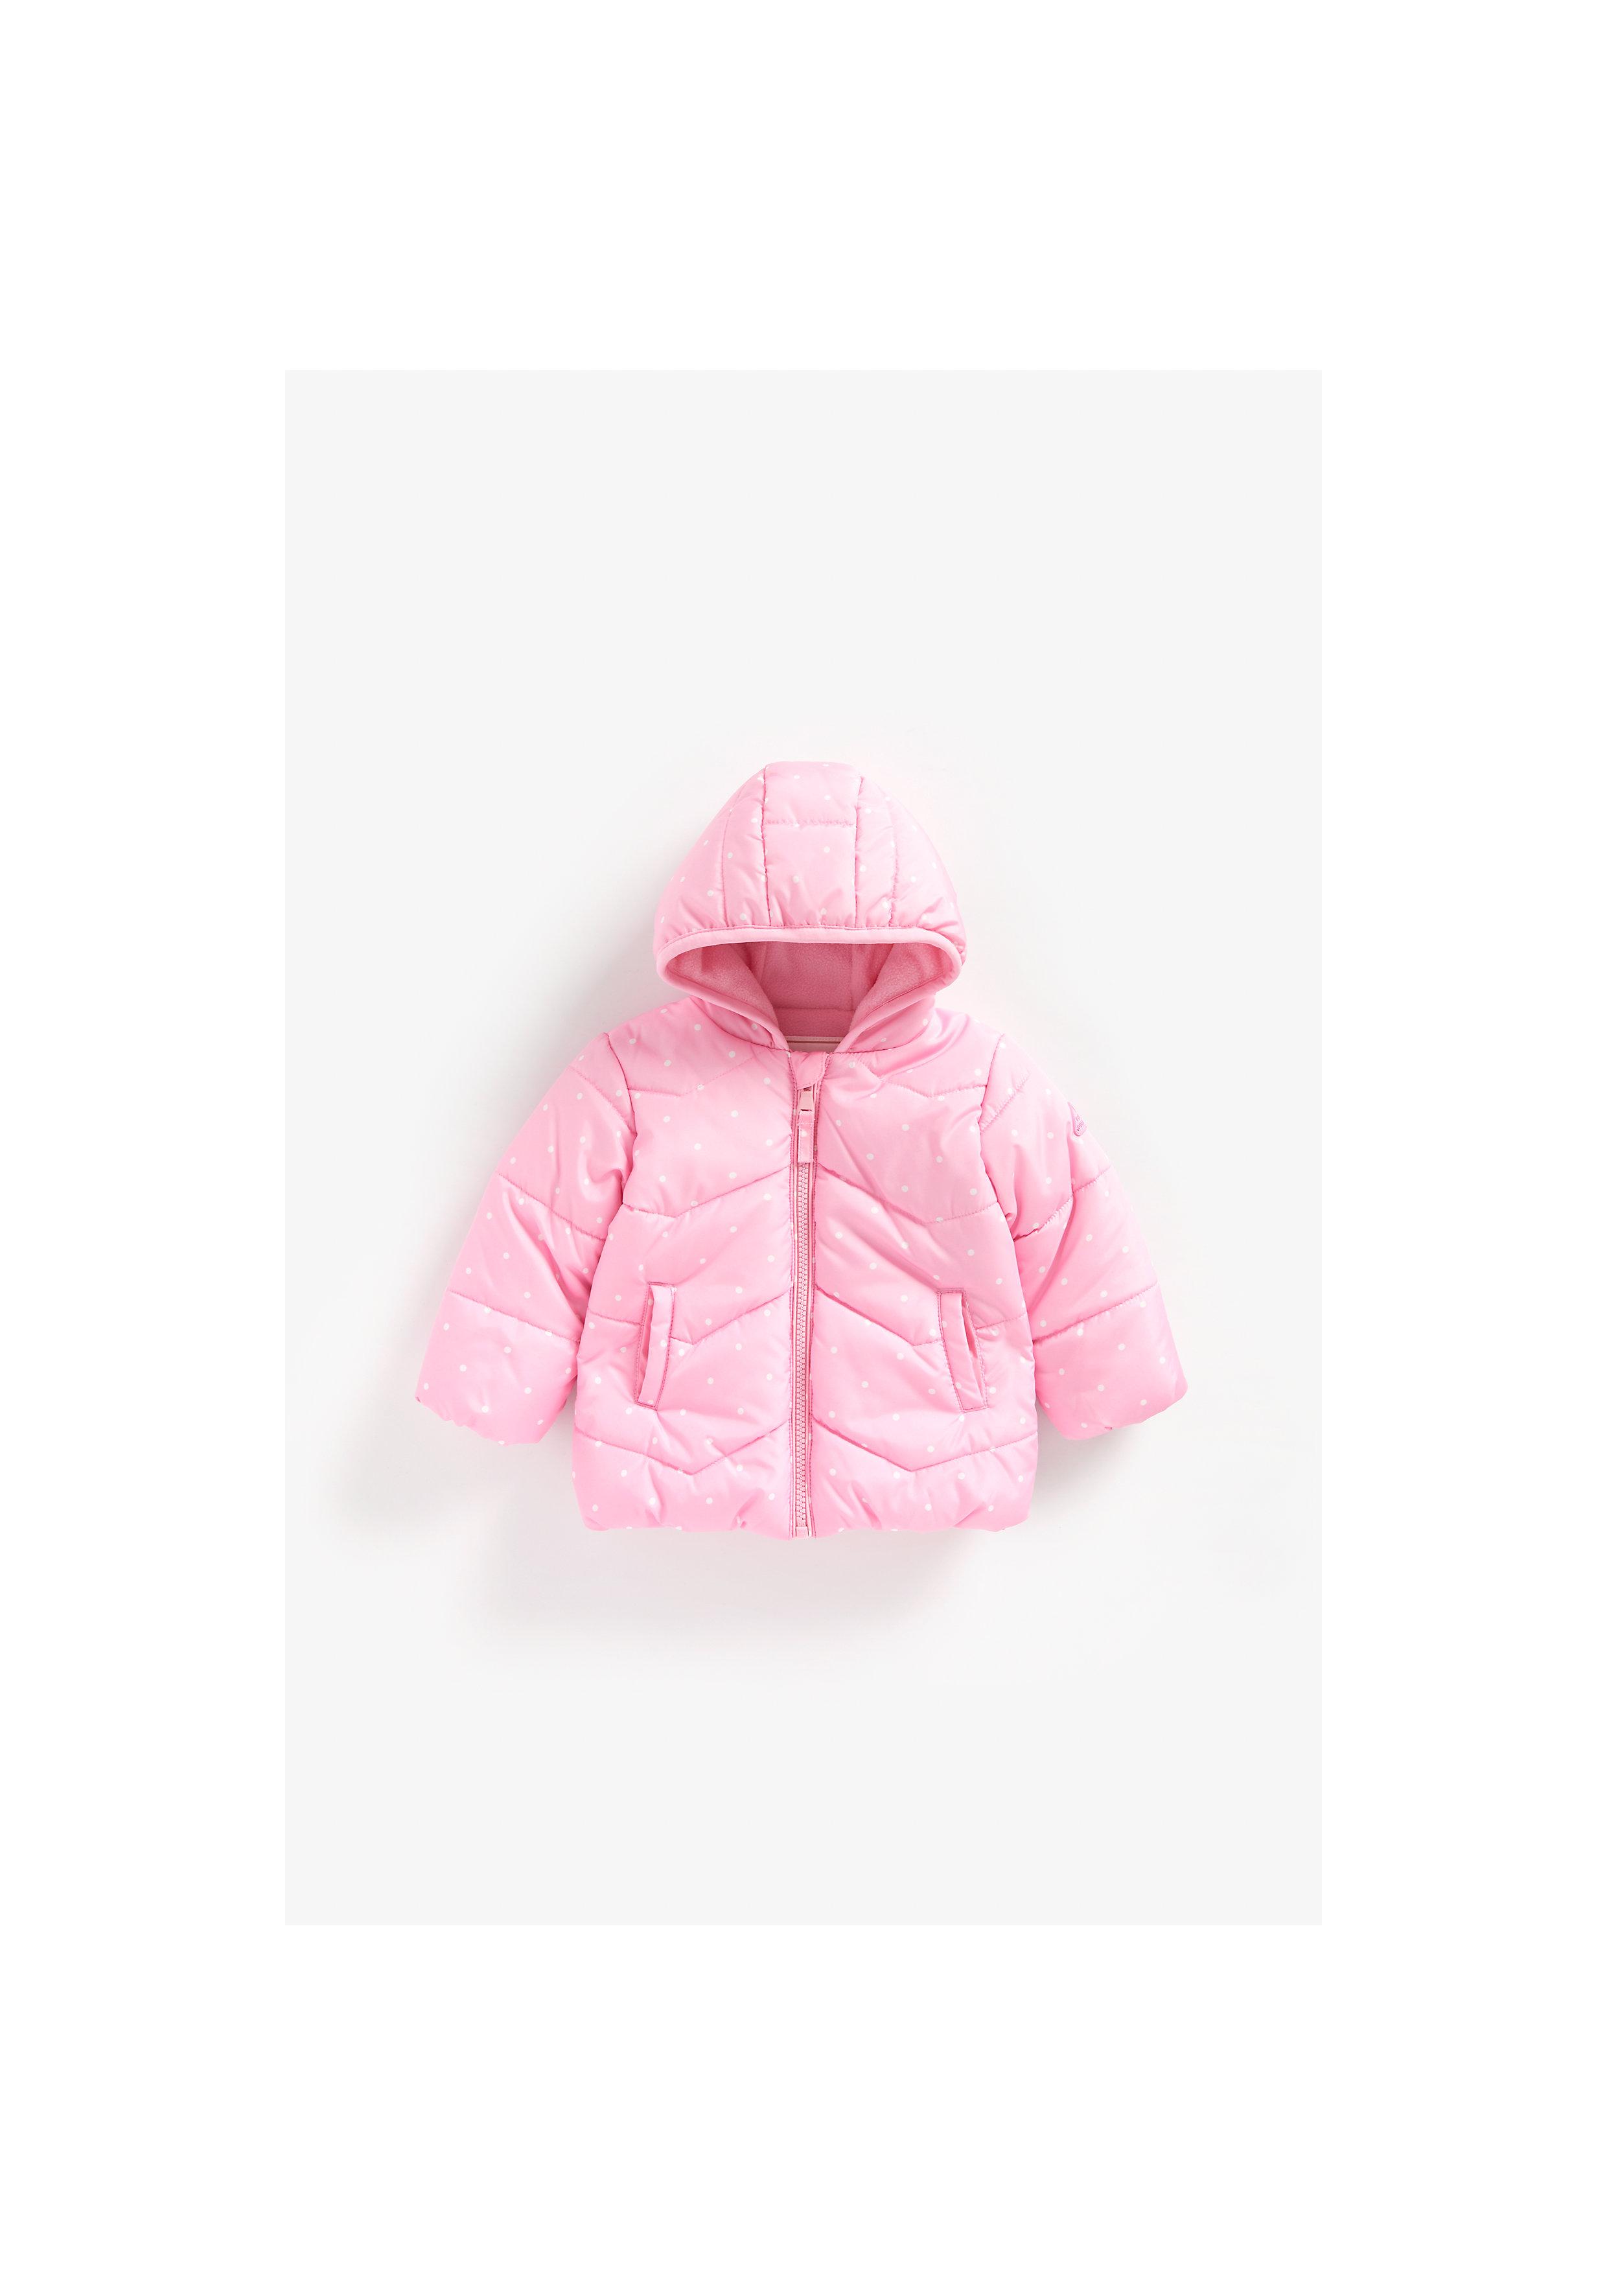 Mothercare | Girls Full Sleeves Fleece Lined Jacket Polka Dot Print - Pink